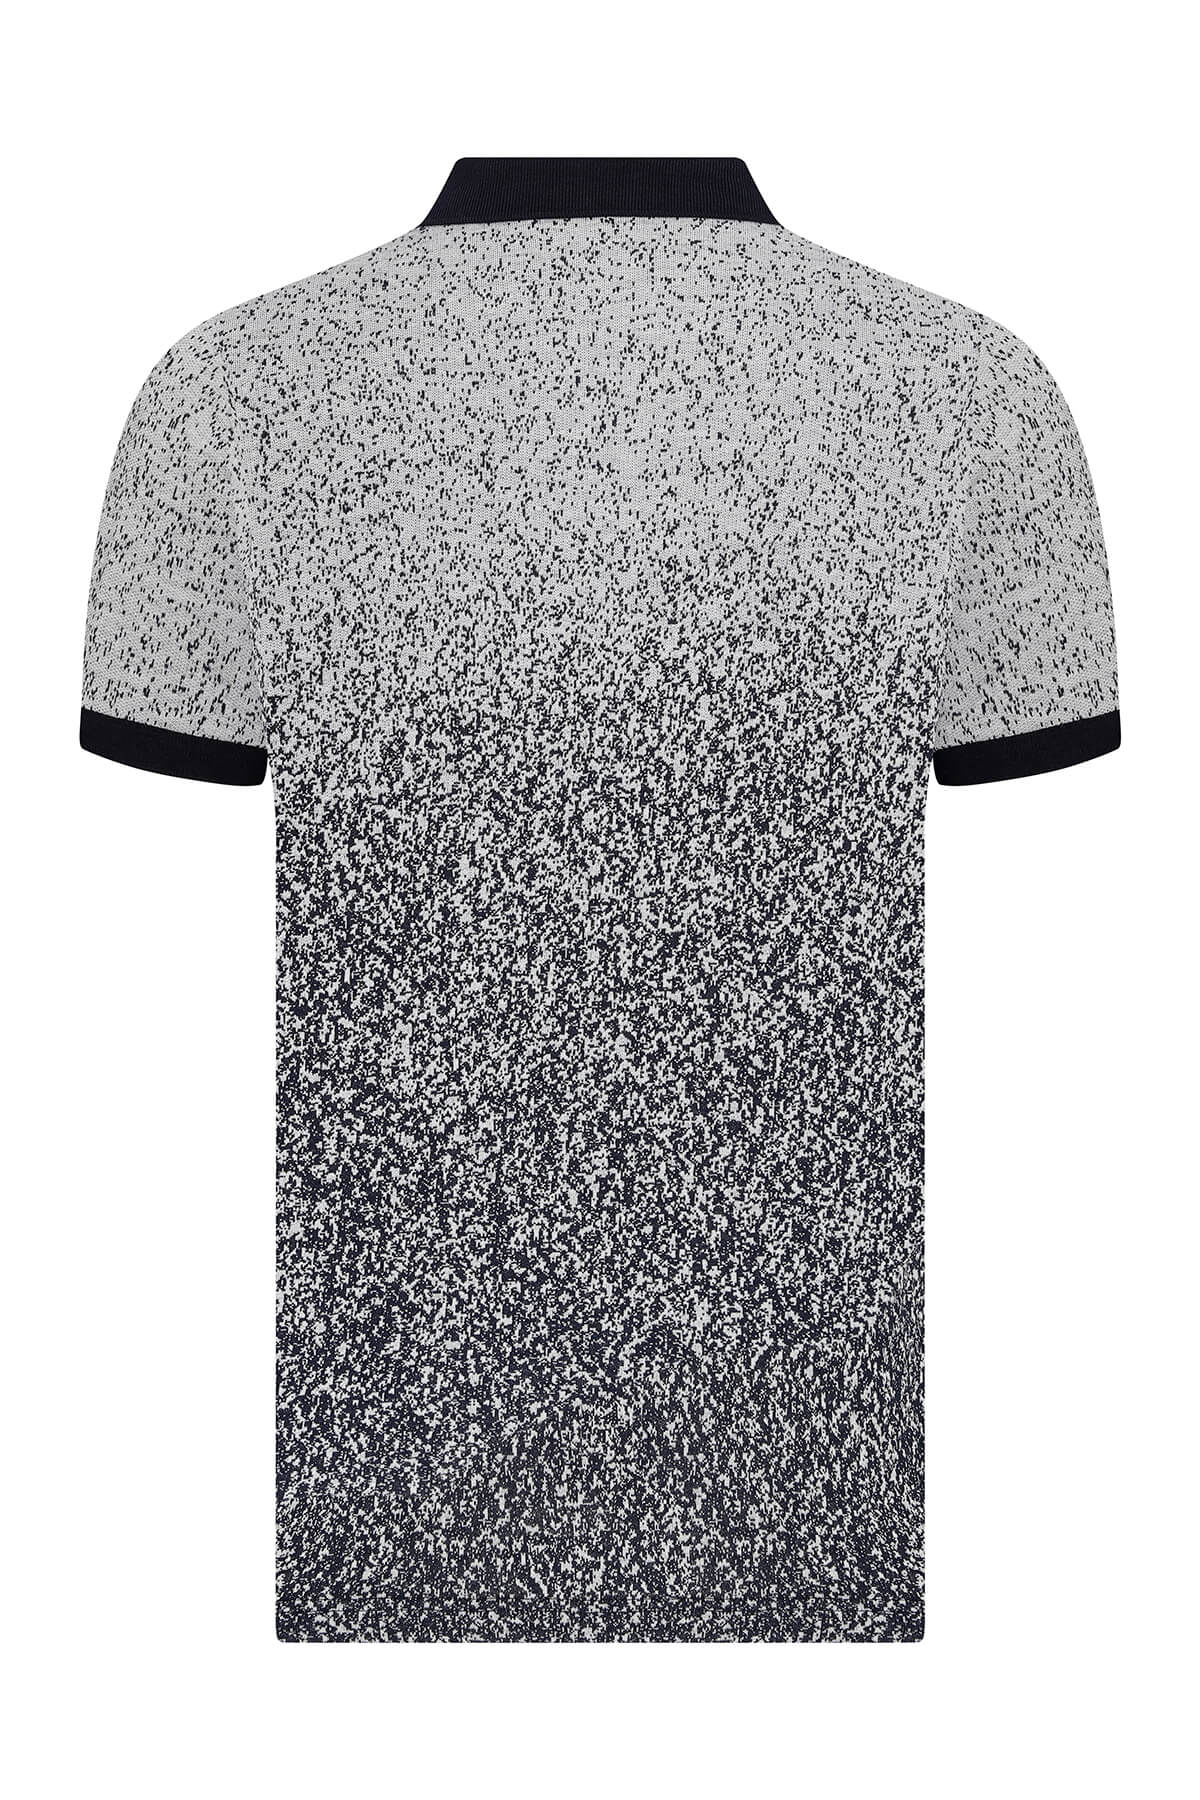 Gri Baskılı Lacivert Polo Yaka Tişört - Thumbnail